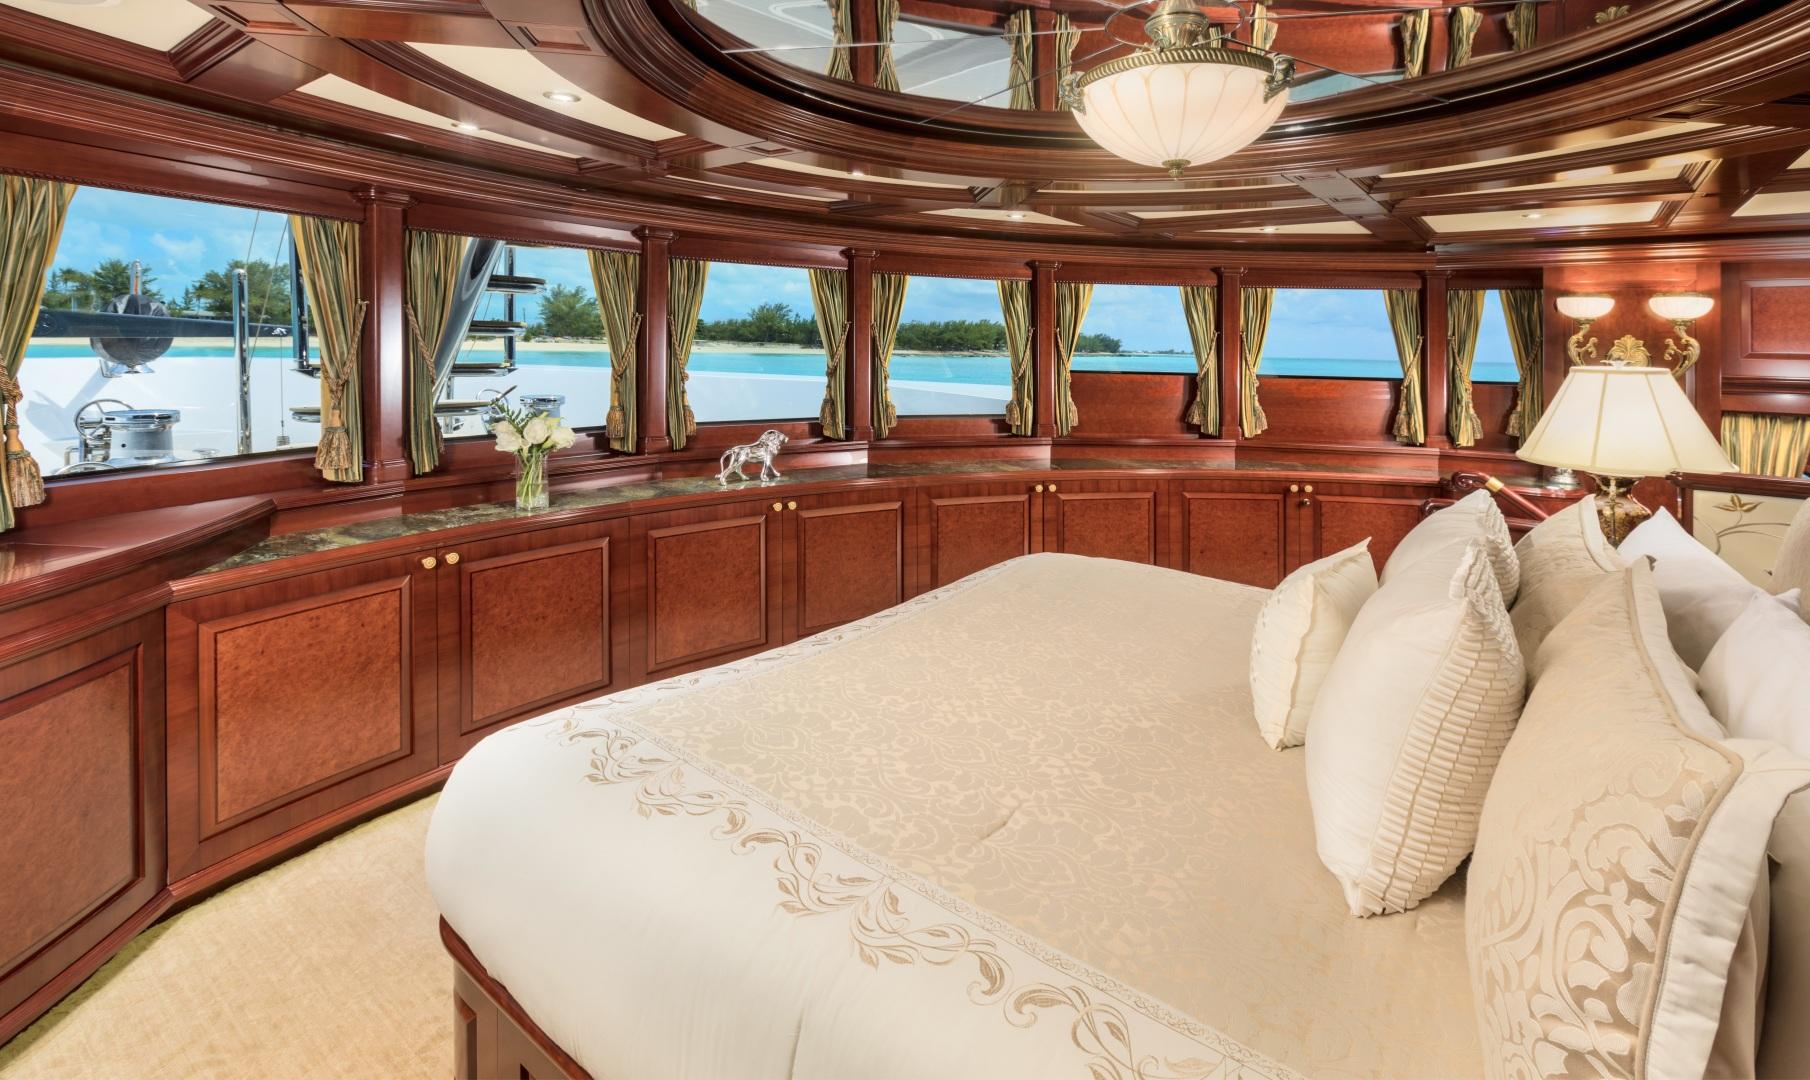 Trinity Yachts-164 Tri-deck Motor Yacht 2008-Amarula Sun Fort Lauderdale-Florida-United States-Luxurious Master Stateroom-1513919 | Thumbnail